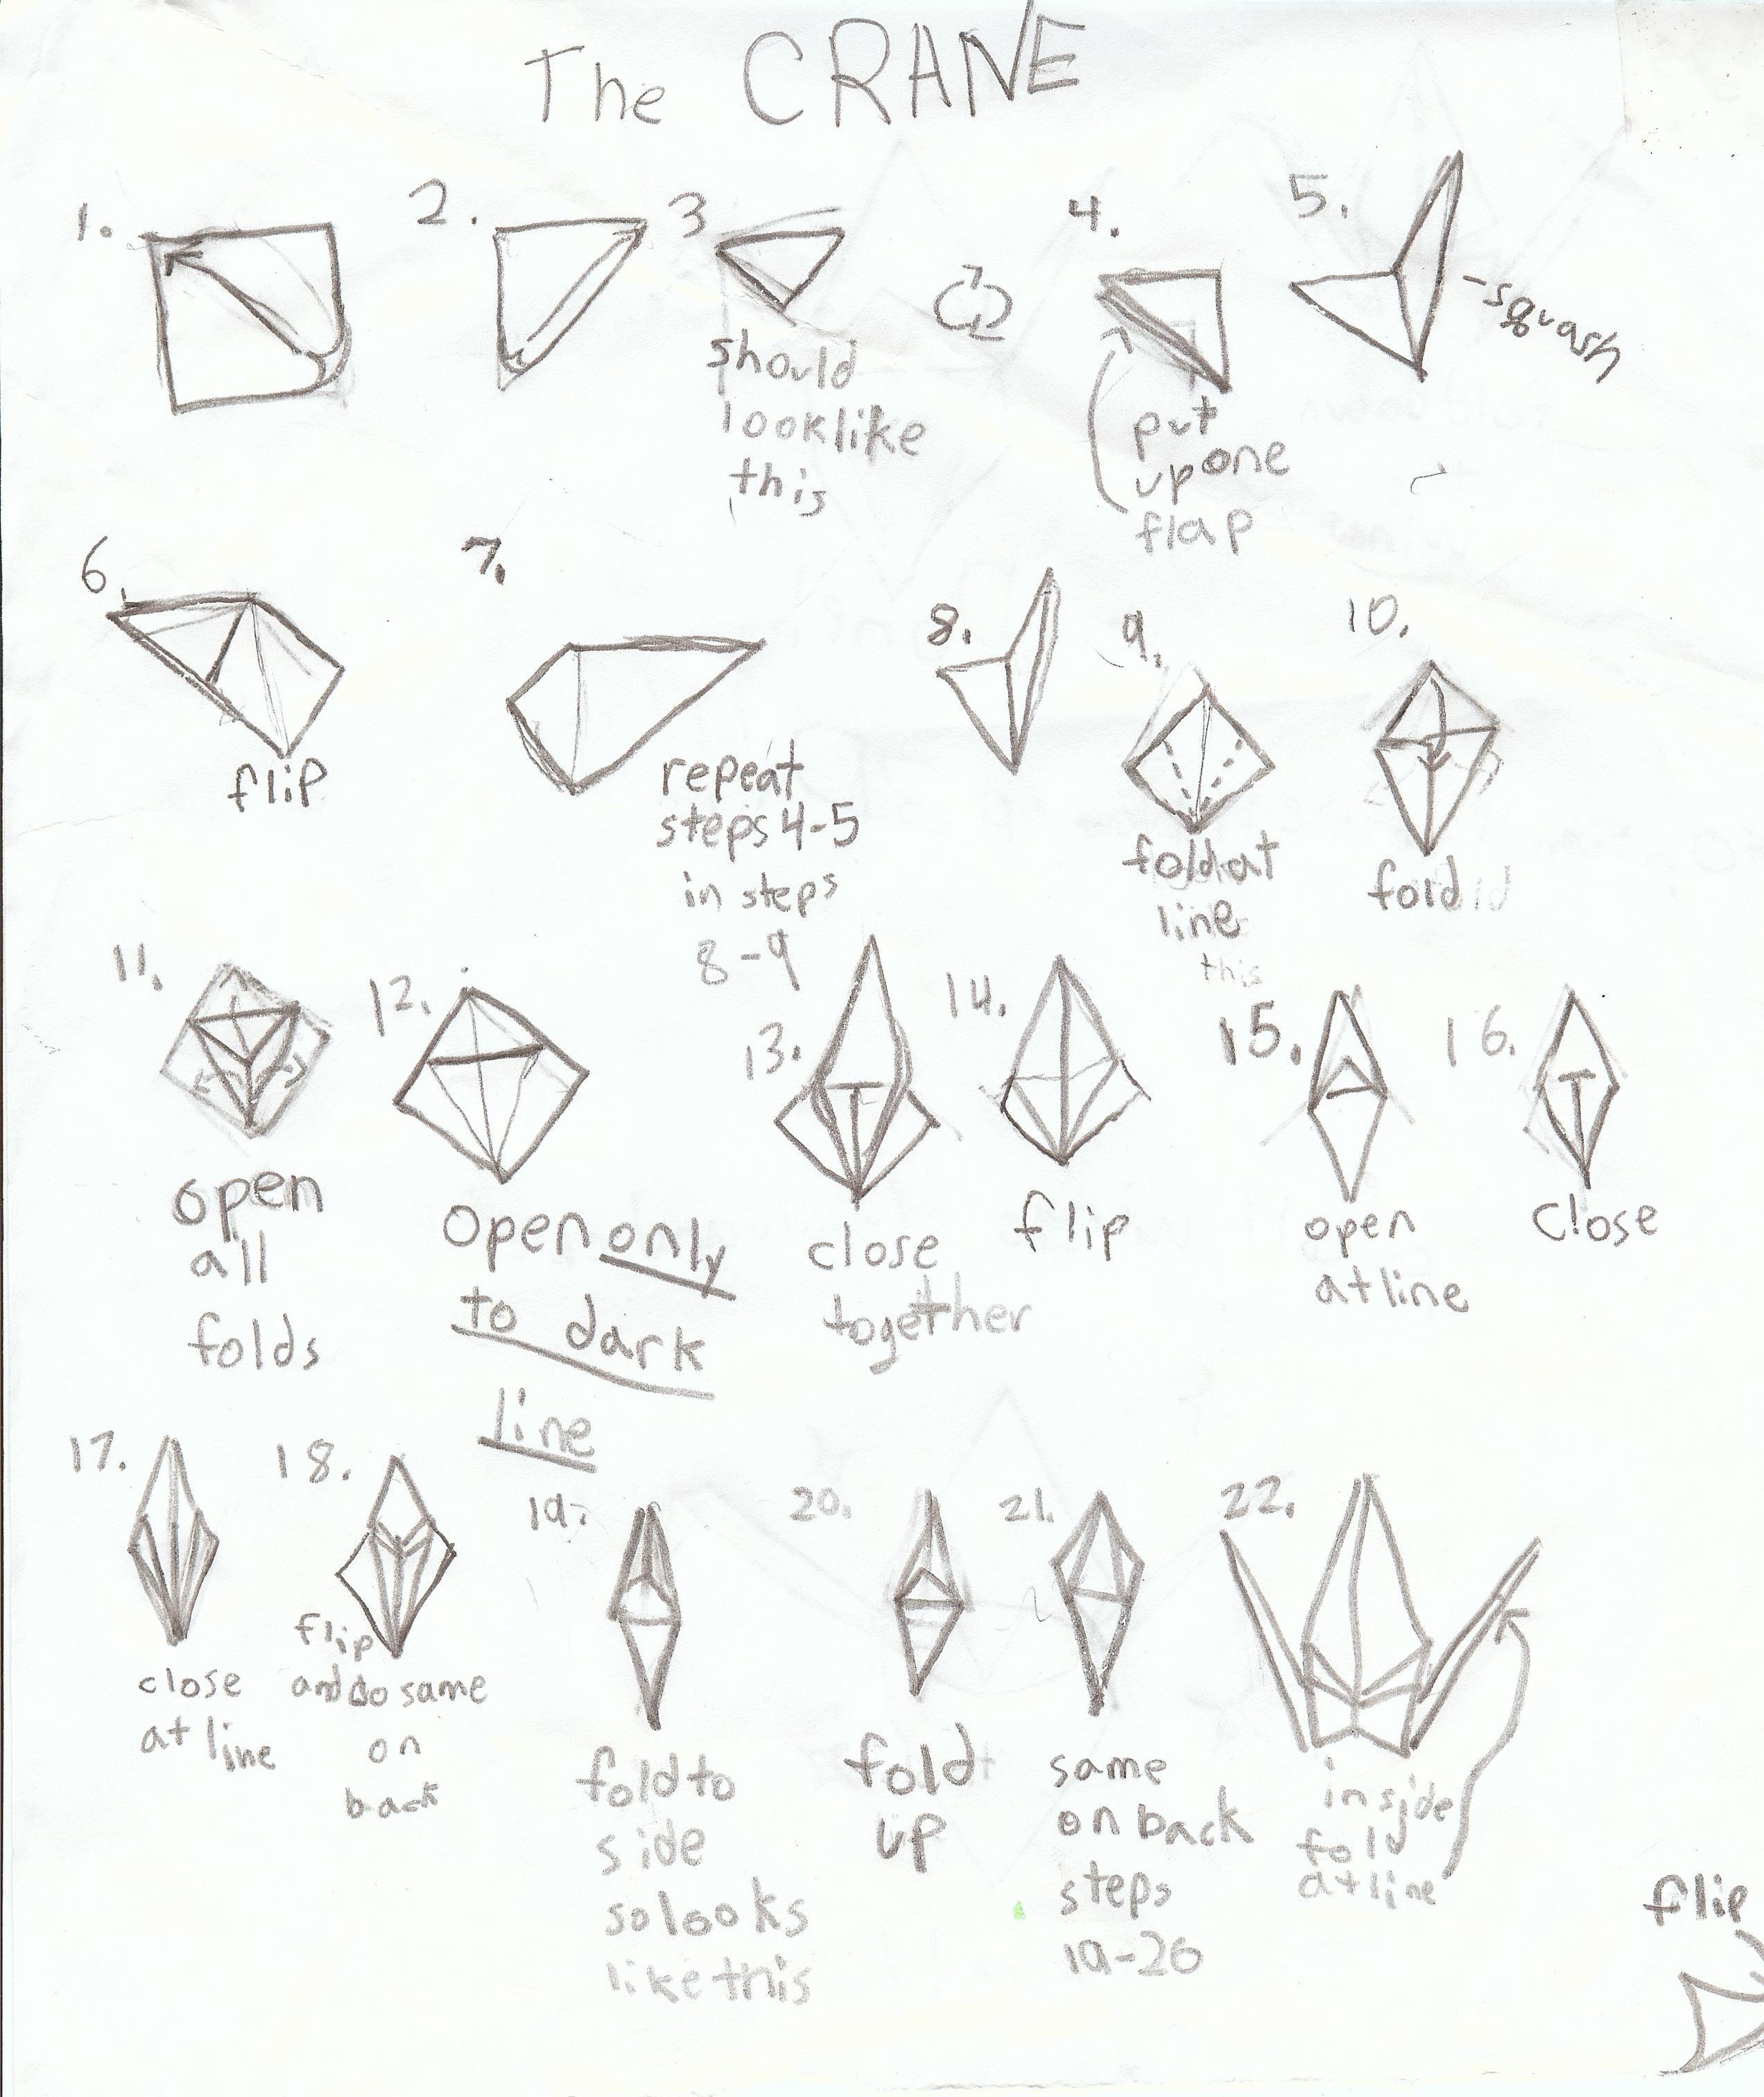 25 Origami Crane Step By Step Instructions Origami Crane